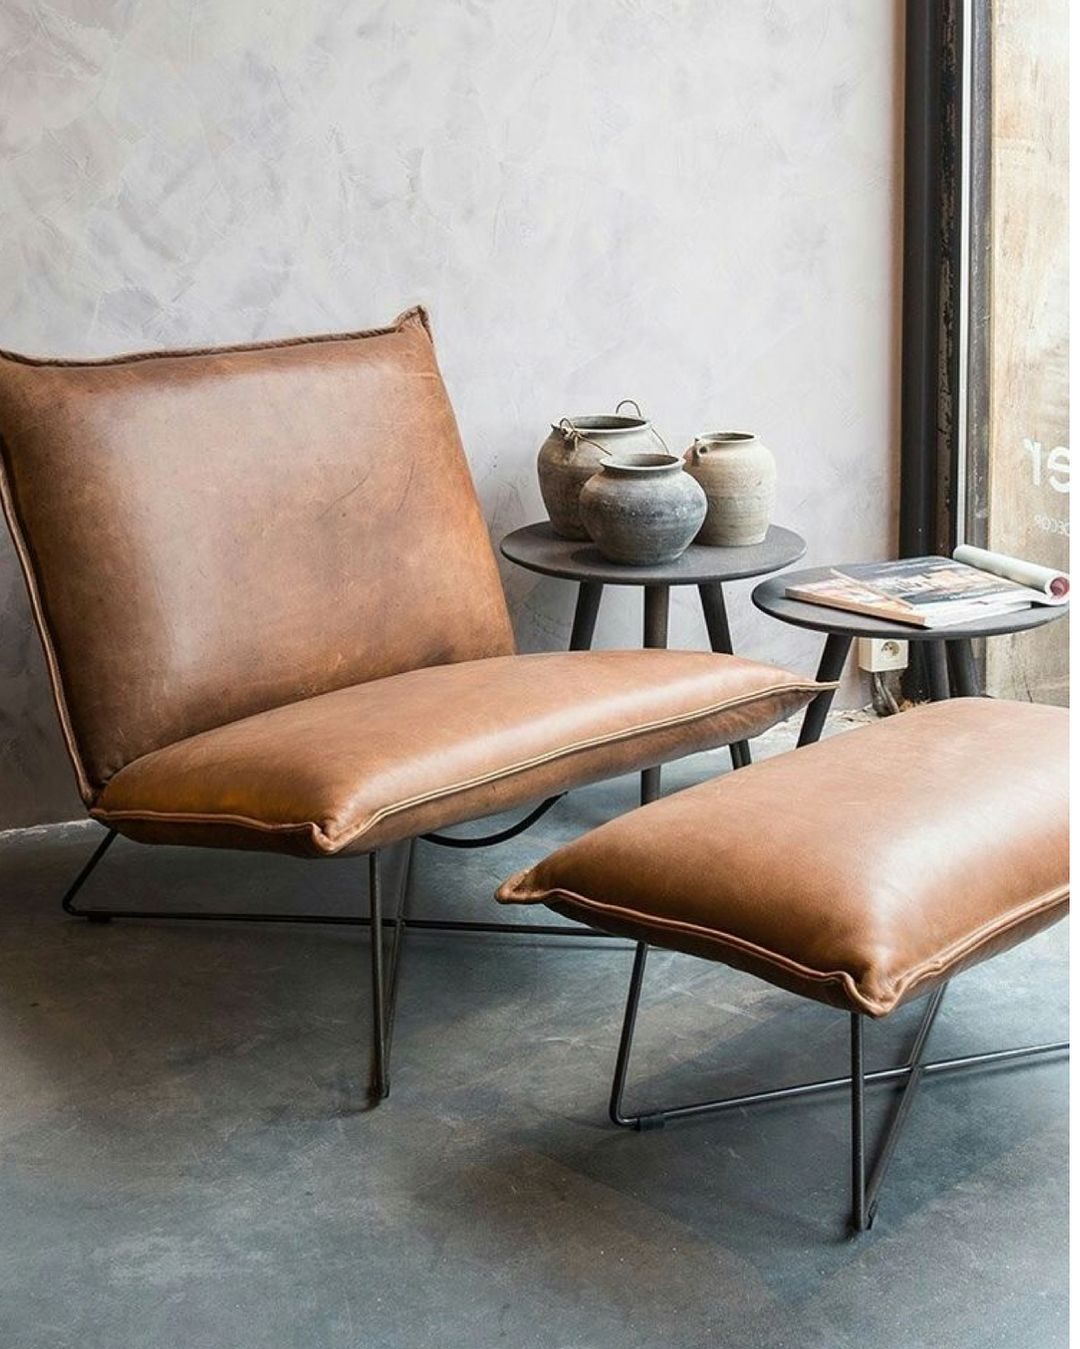 Ikea Leren Stoel.Dolap Ikea Tasarim Koctas Sifonyer Komidin Sandalye